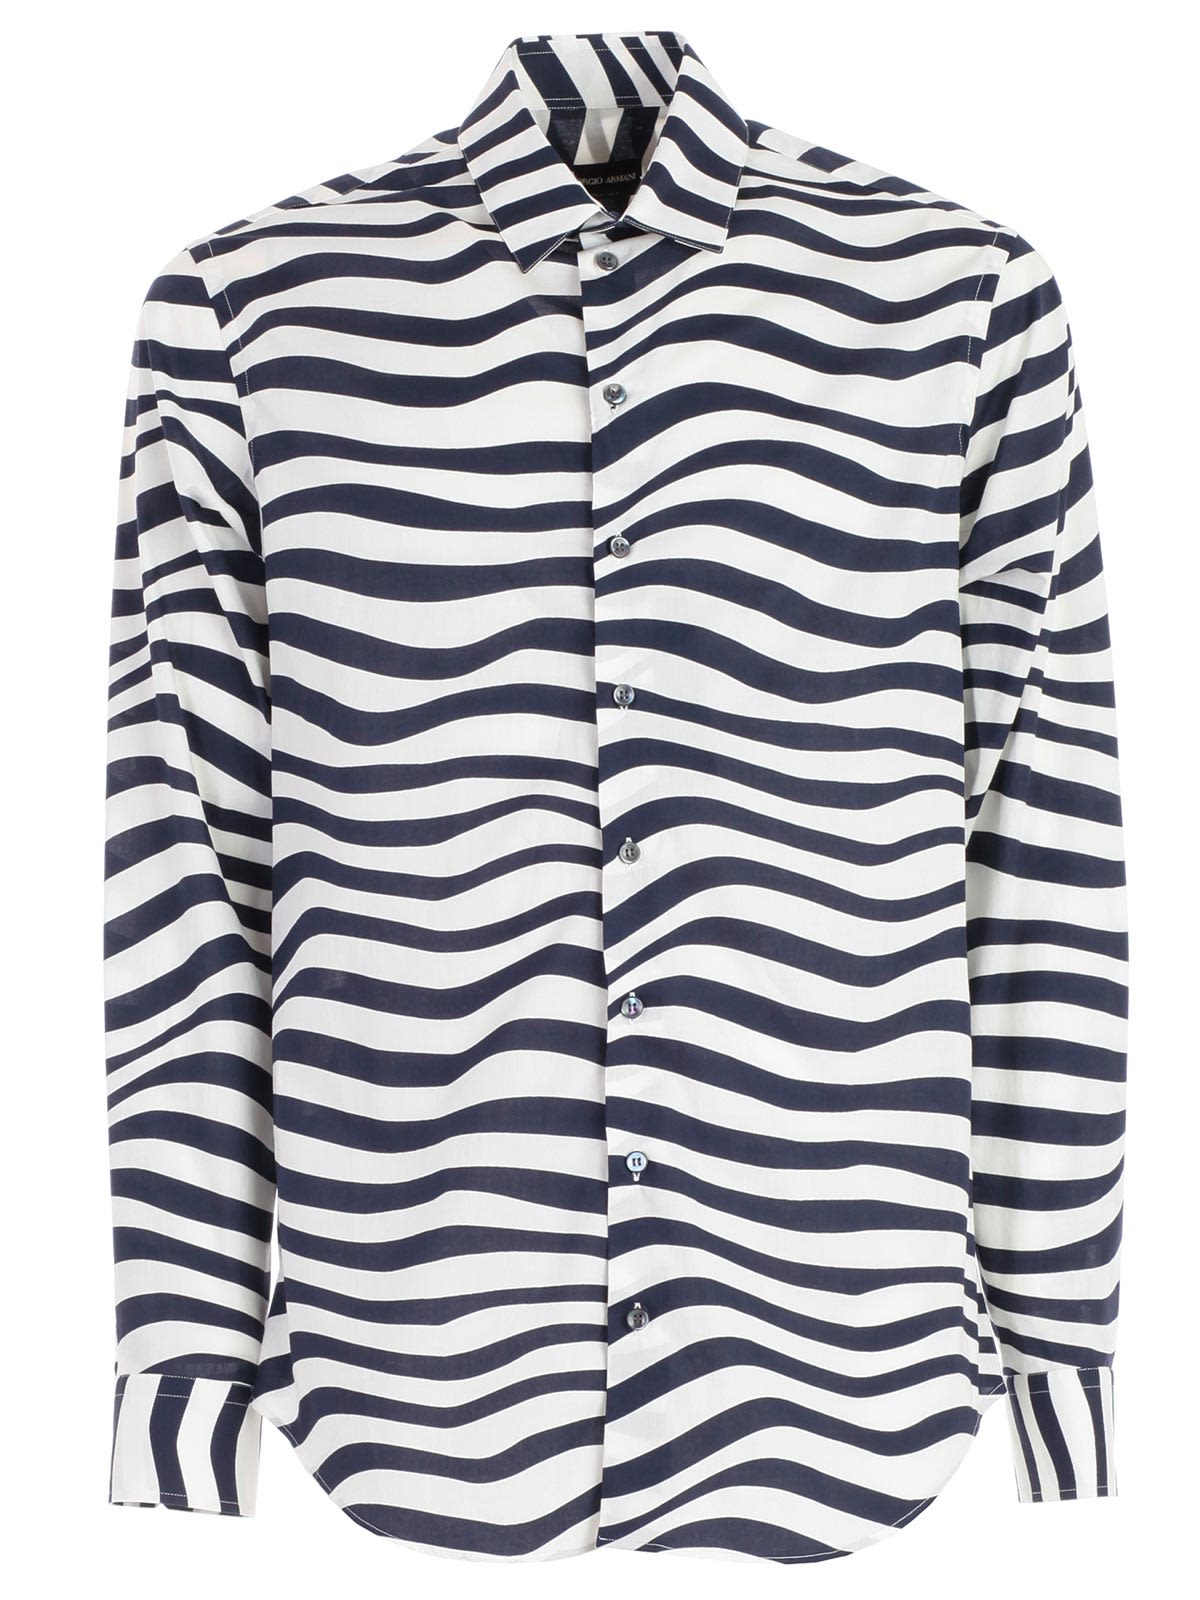 4193beef09e Giorgio Armani Giorgio Armani Striped Shirt - White - 10824995